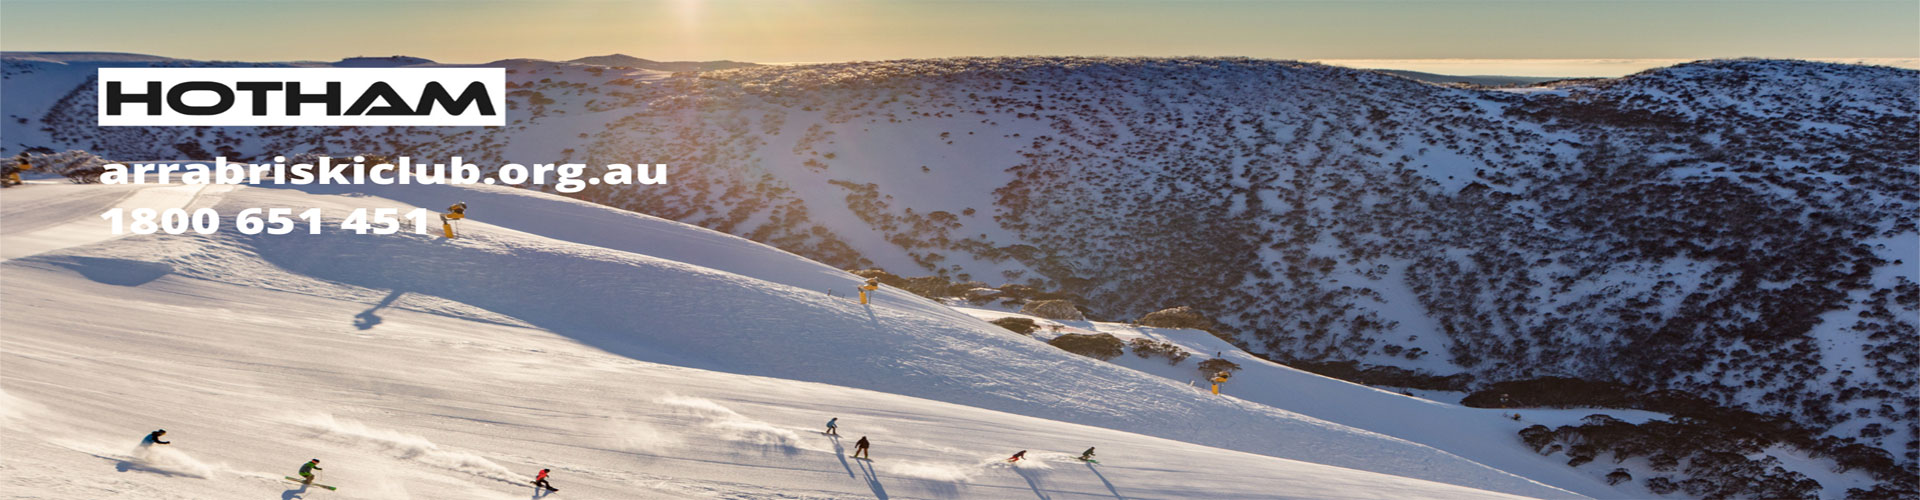 skiing heavenly valley arrabri ski club